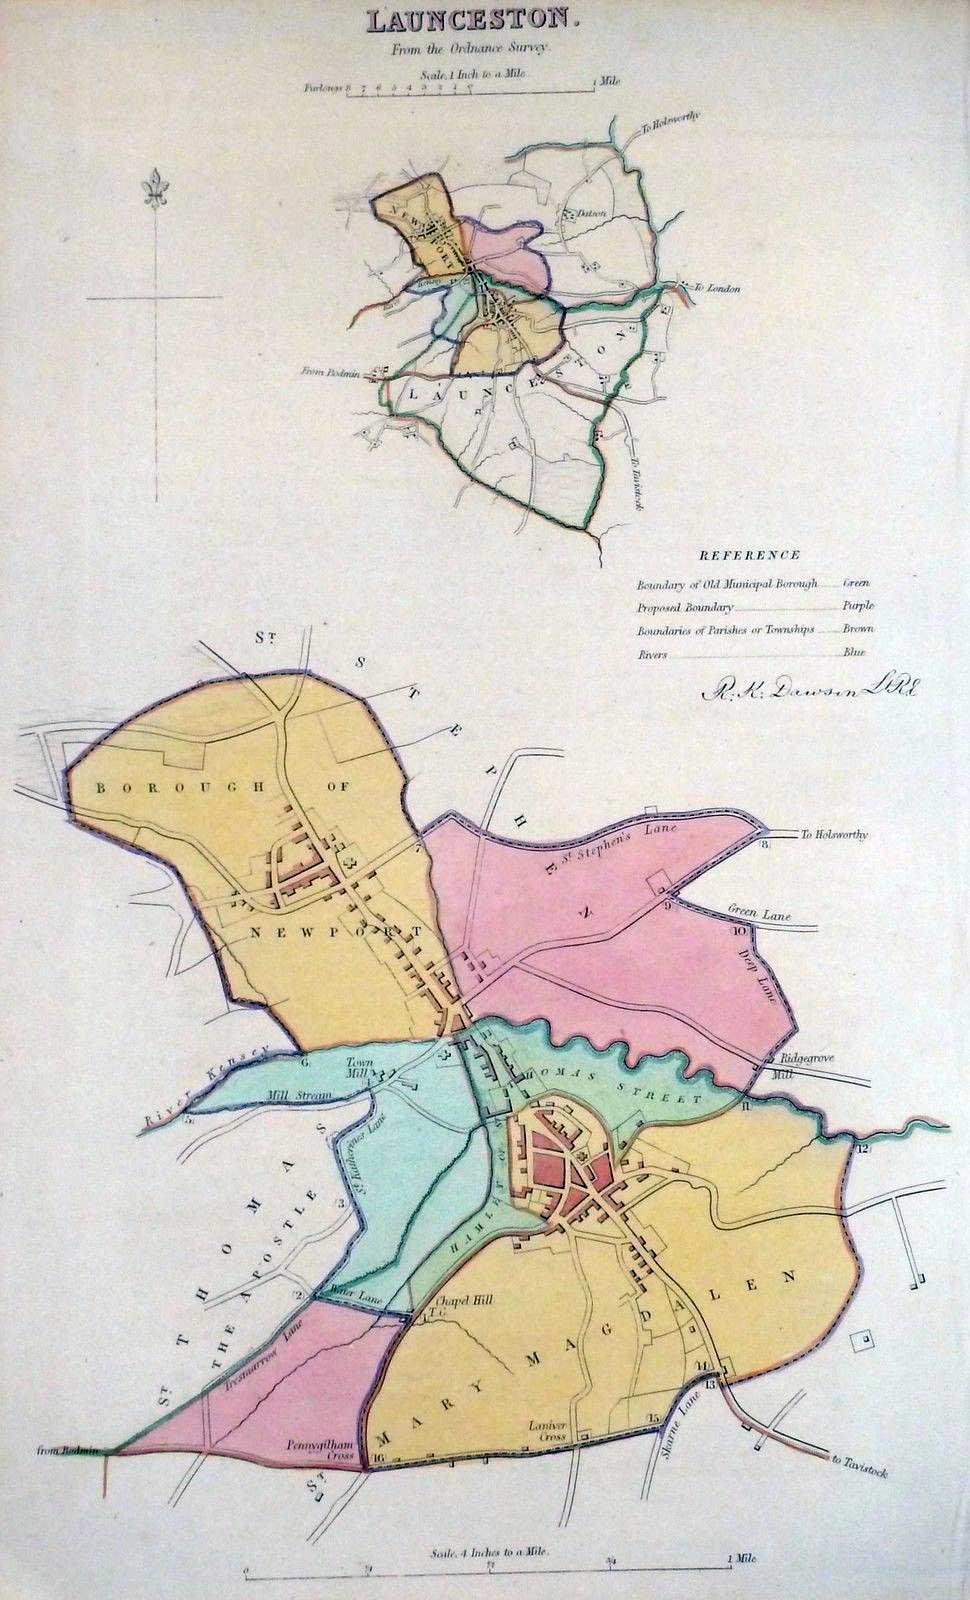 1832-map-of-launceston